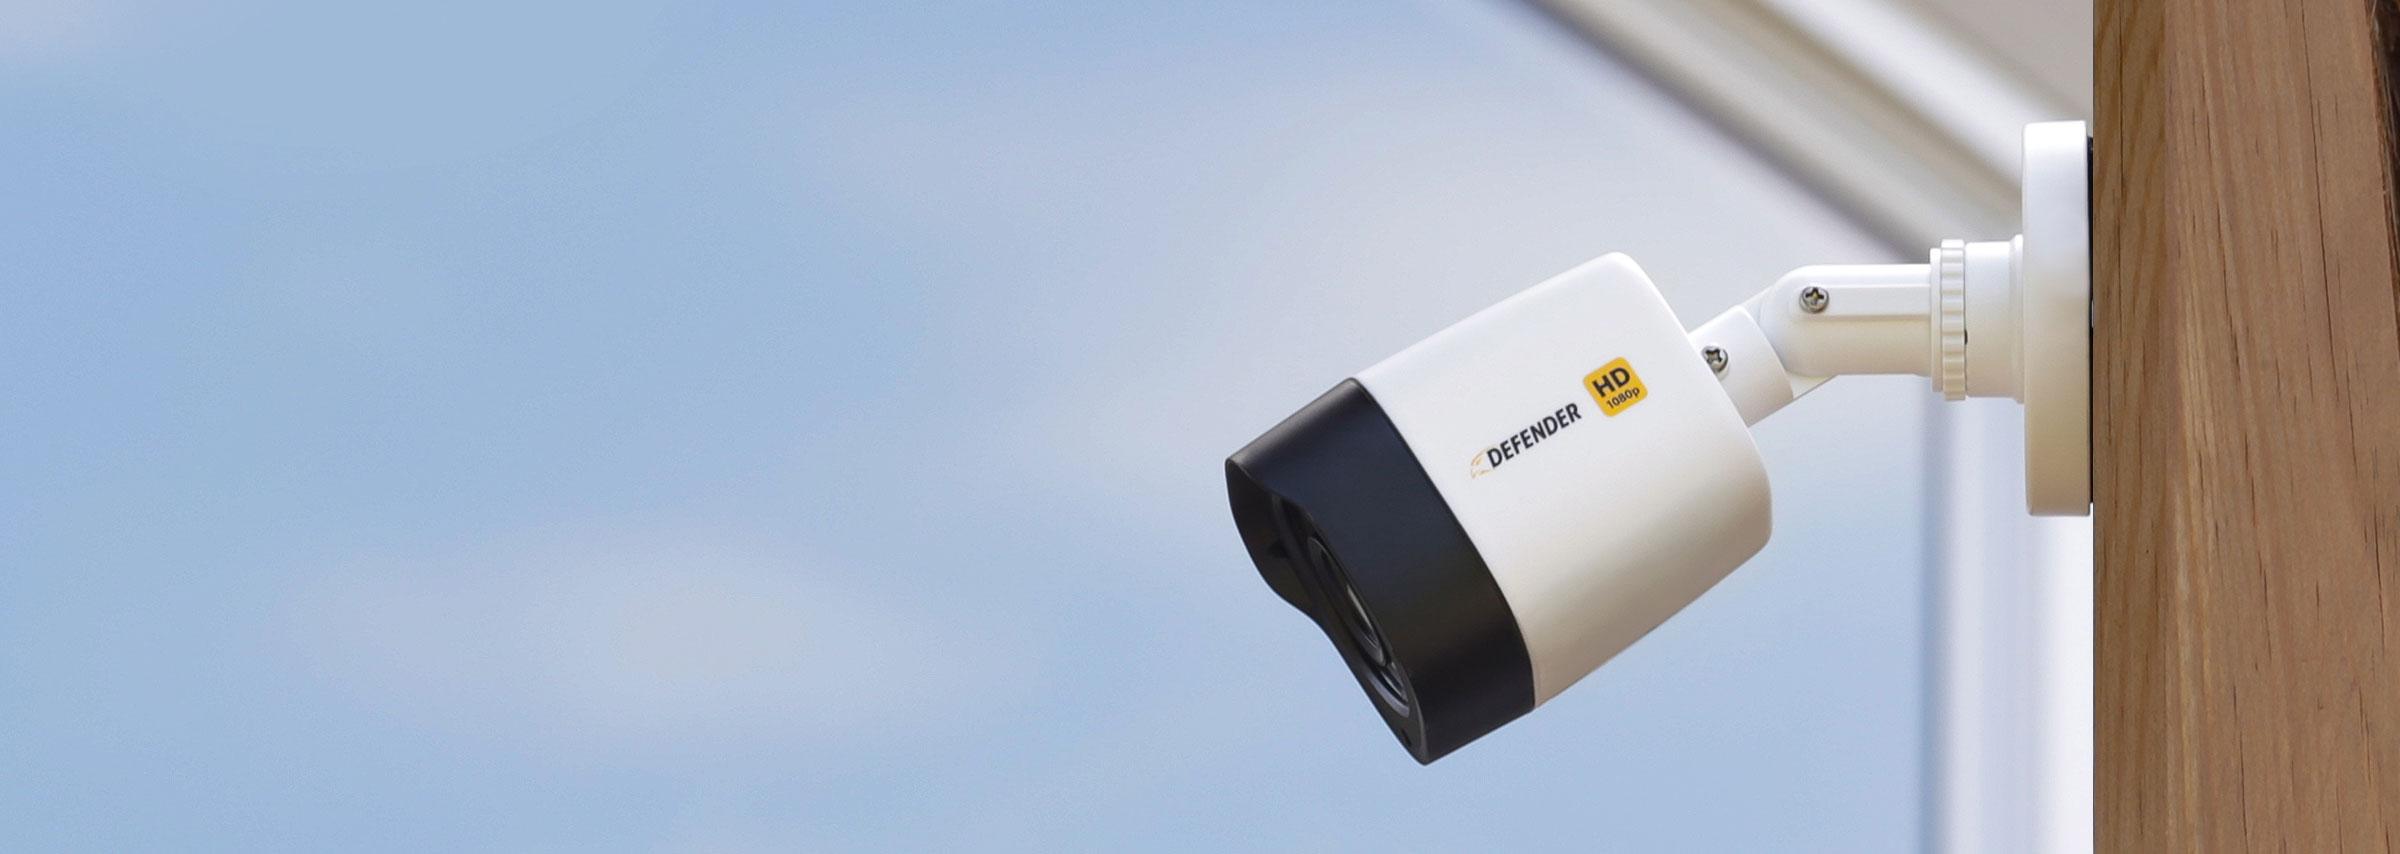 Defender HD Security System HD1T8D4B4